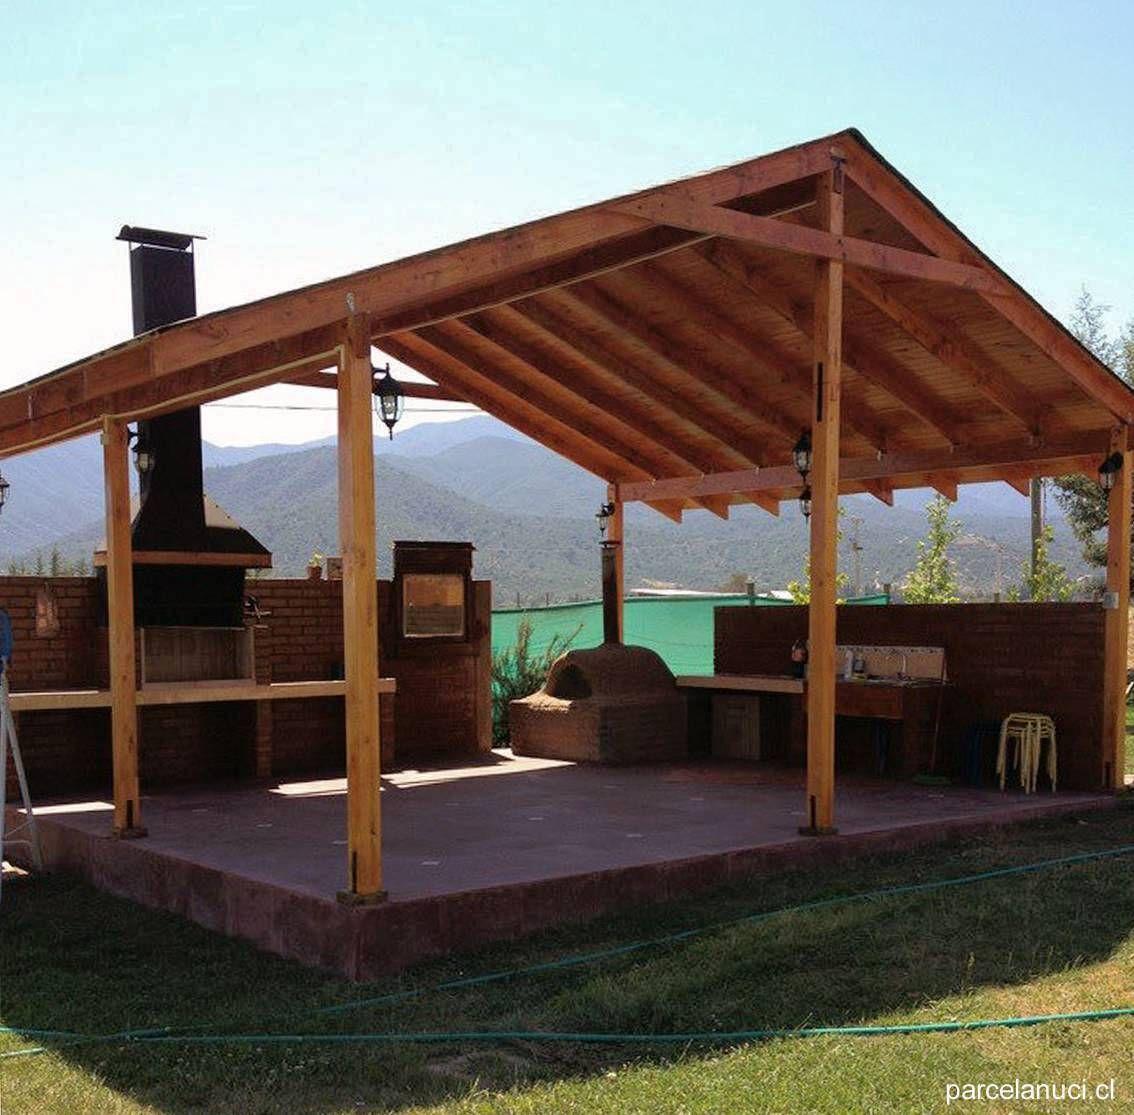 Quincho con techo de madera a dos 1134 1115 for Cobertizo de jardin de techo plano de pvc